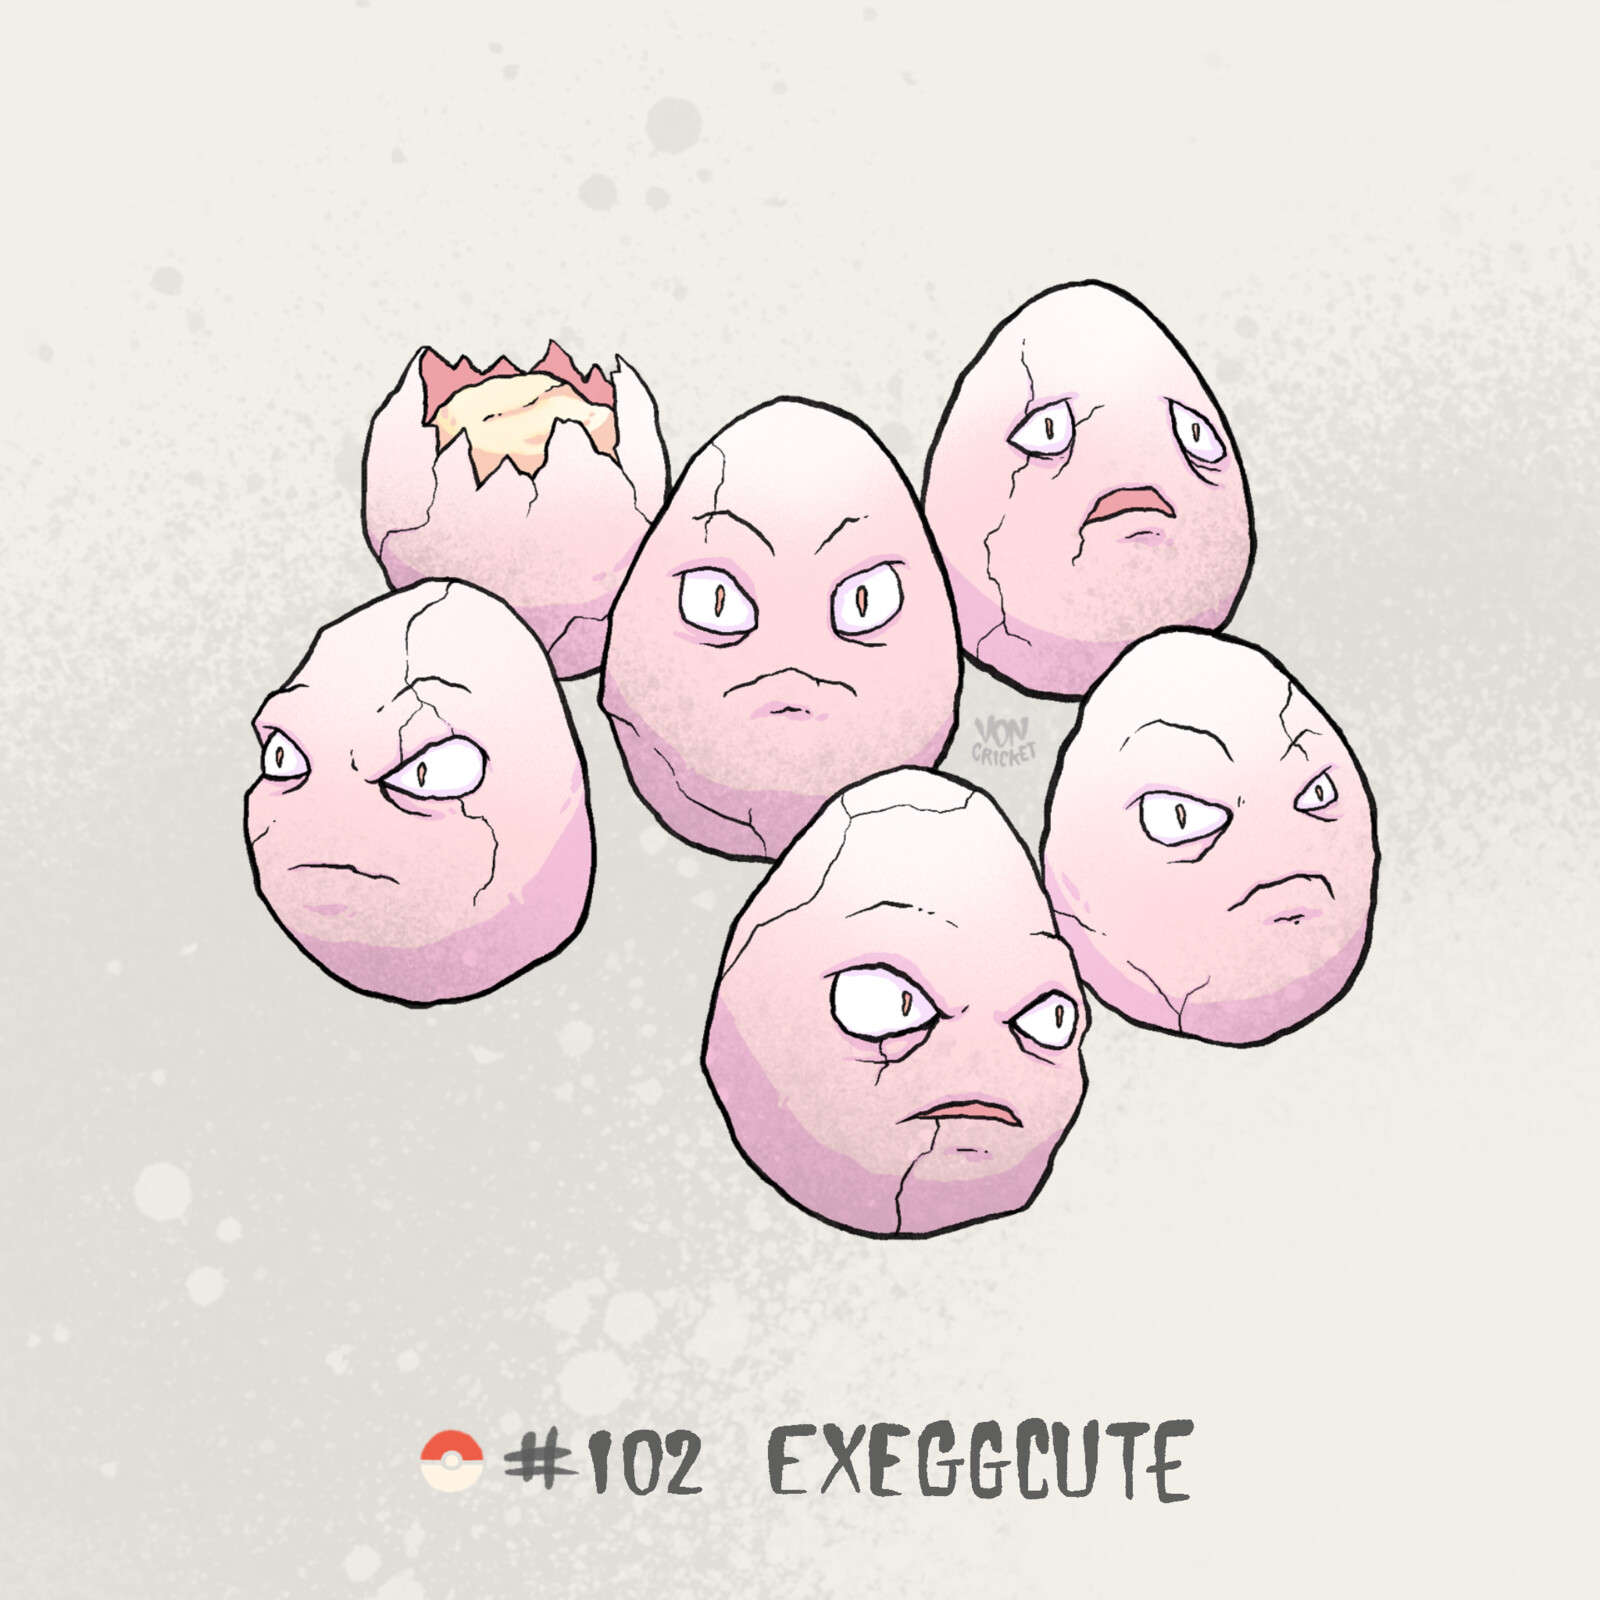 #102 Exeggcute